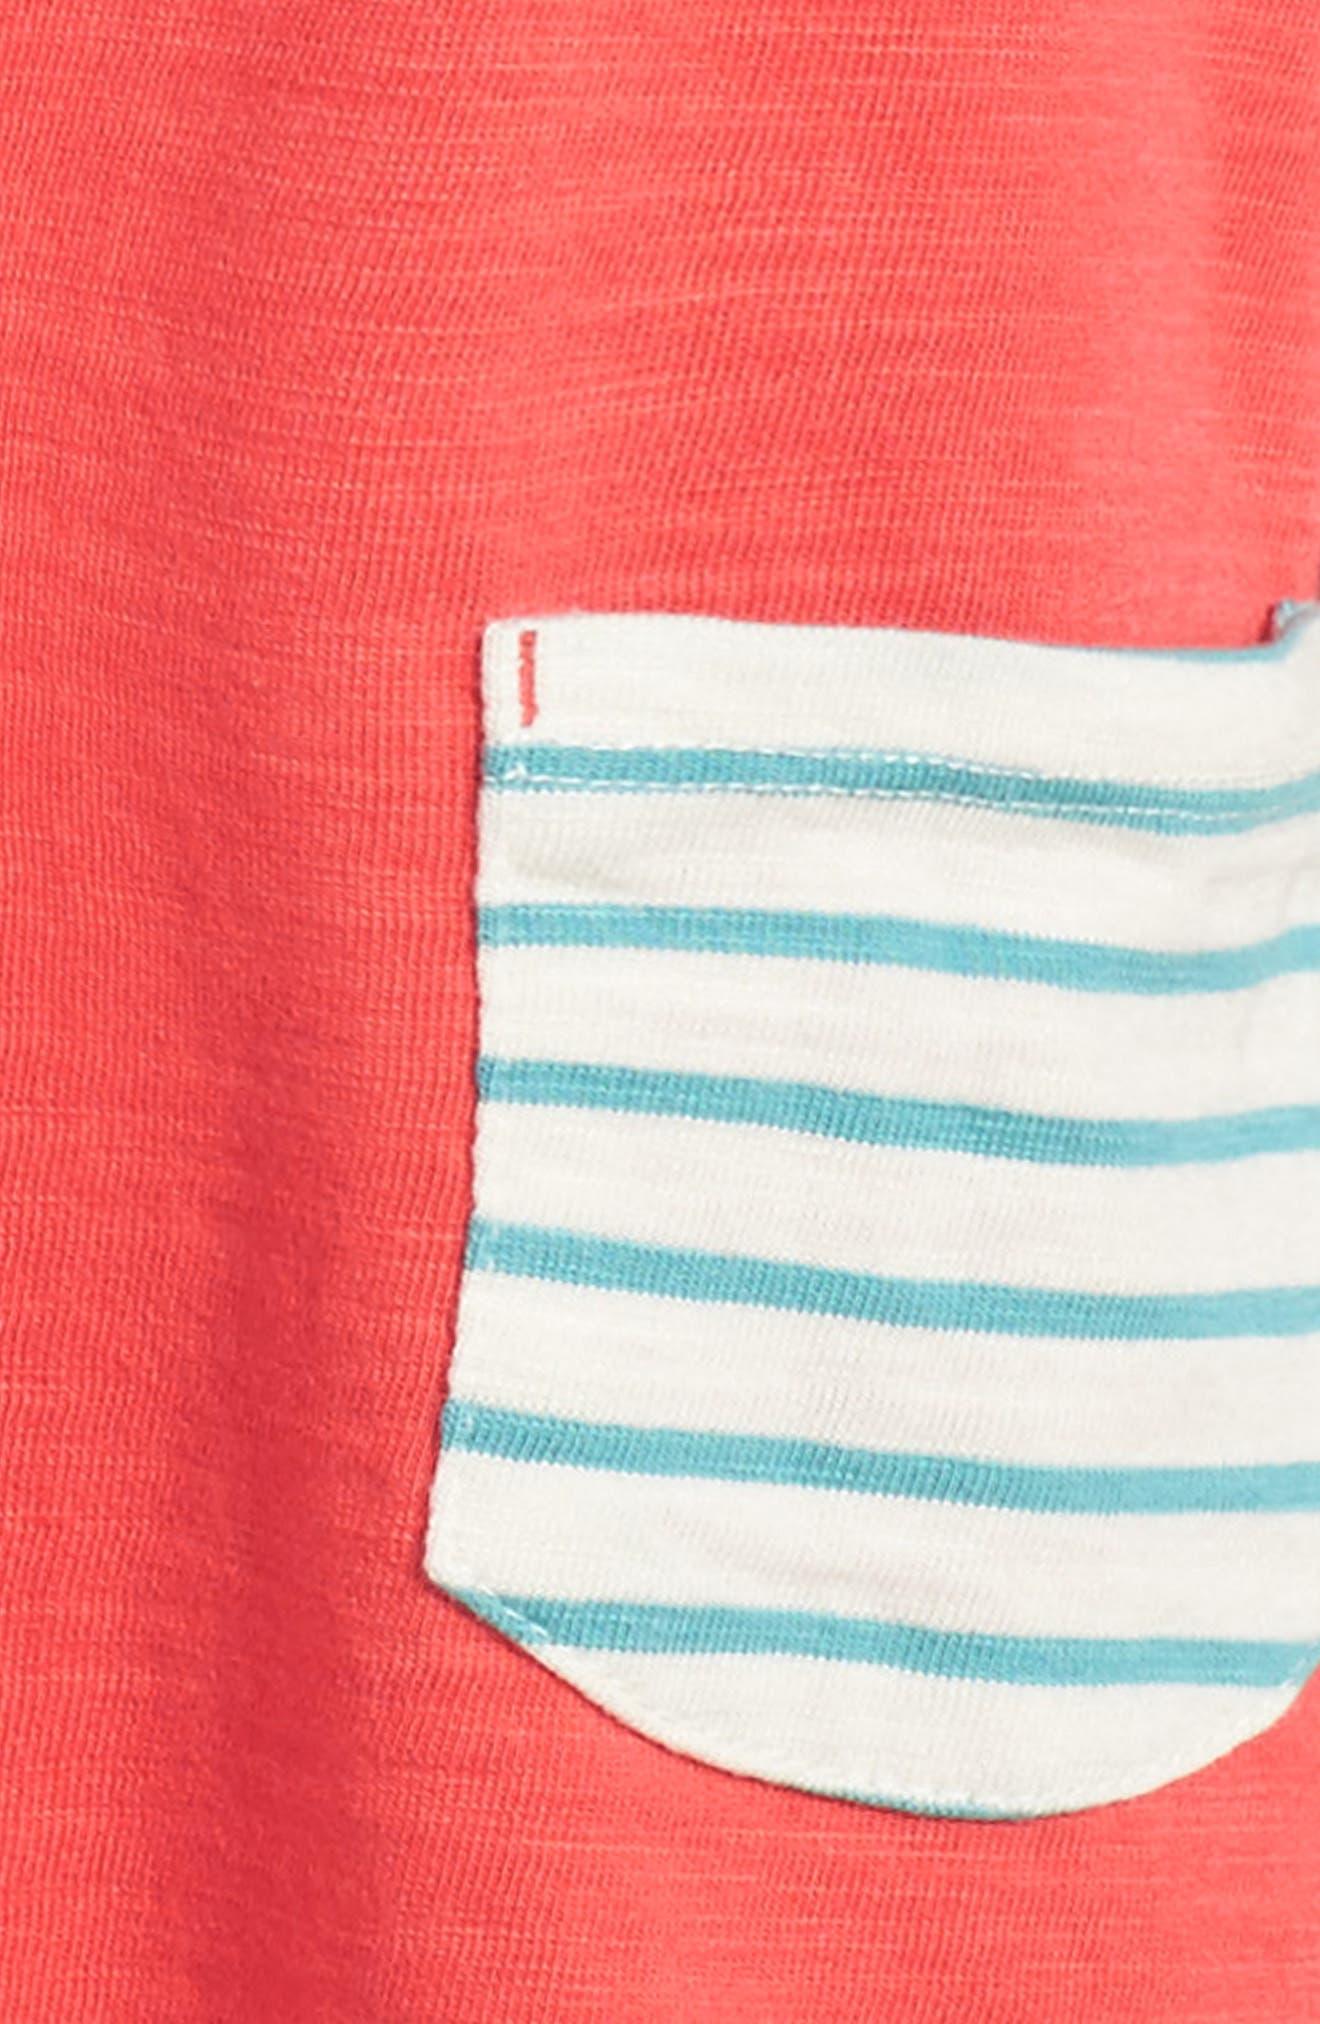 Stripey Jersey Dress,                             Alternate thumbnail 3, color,                             614